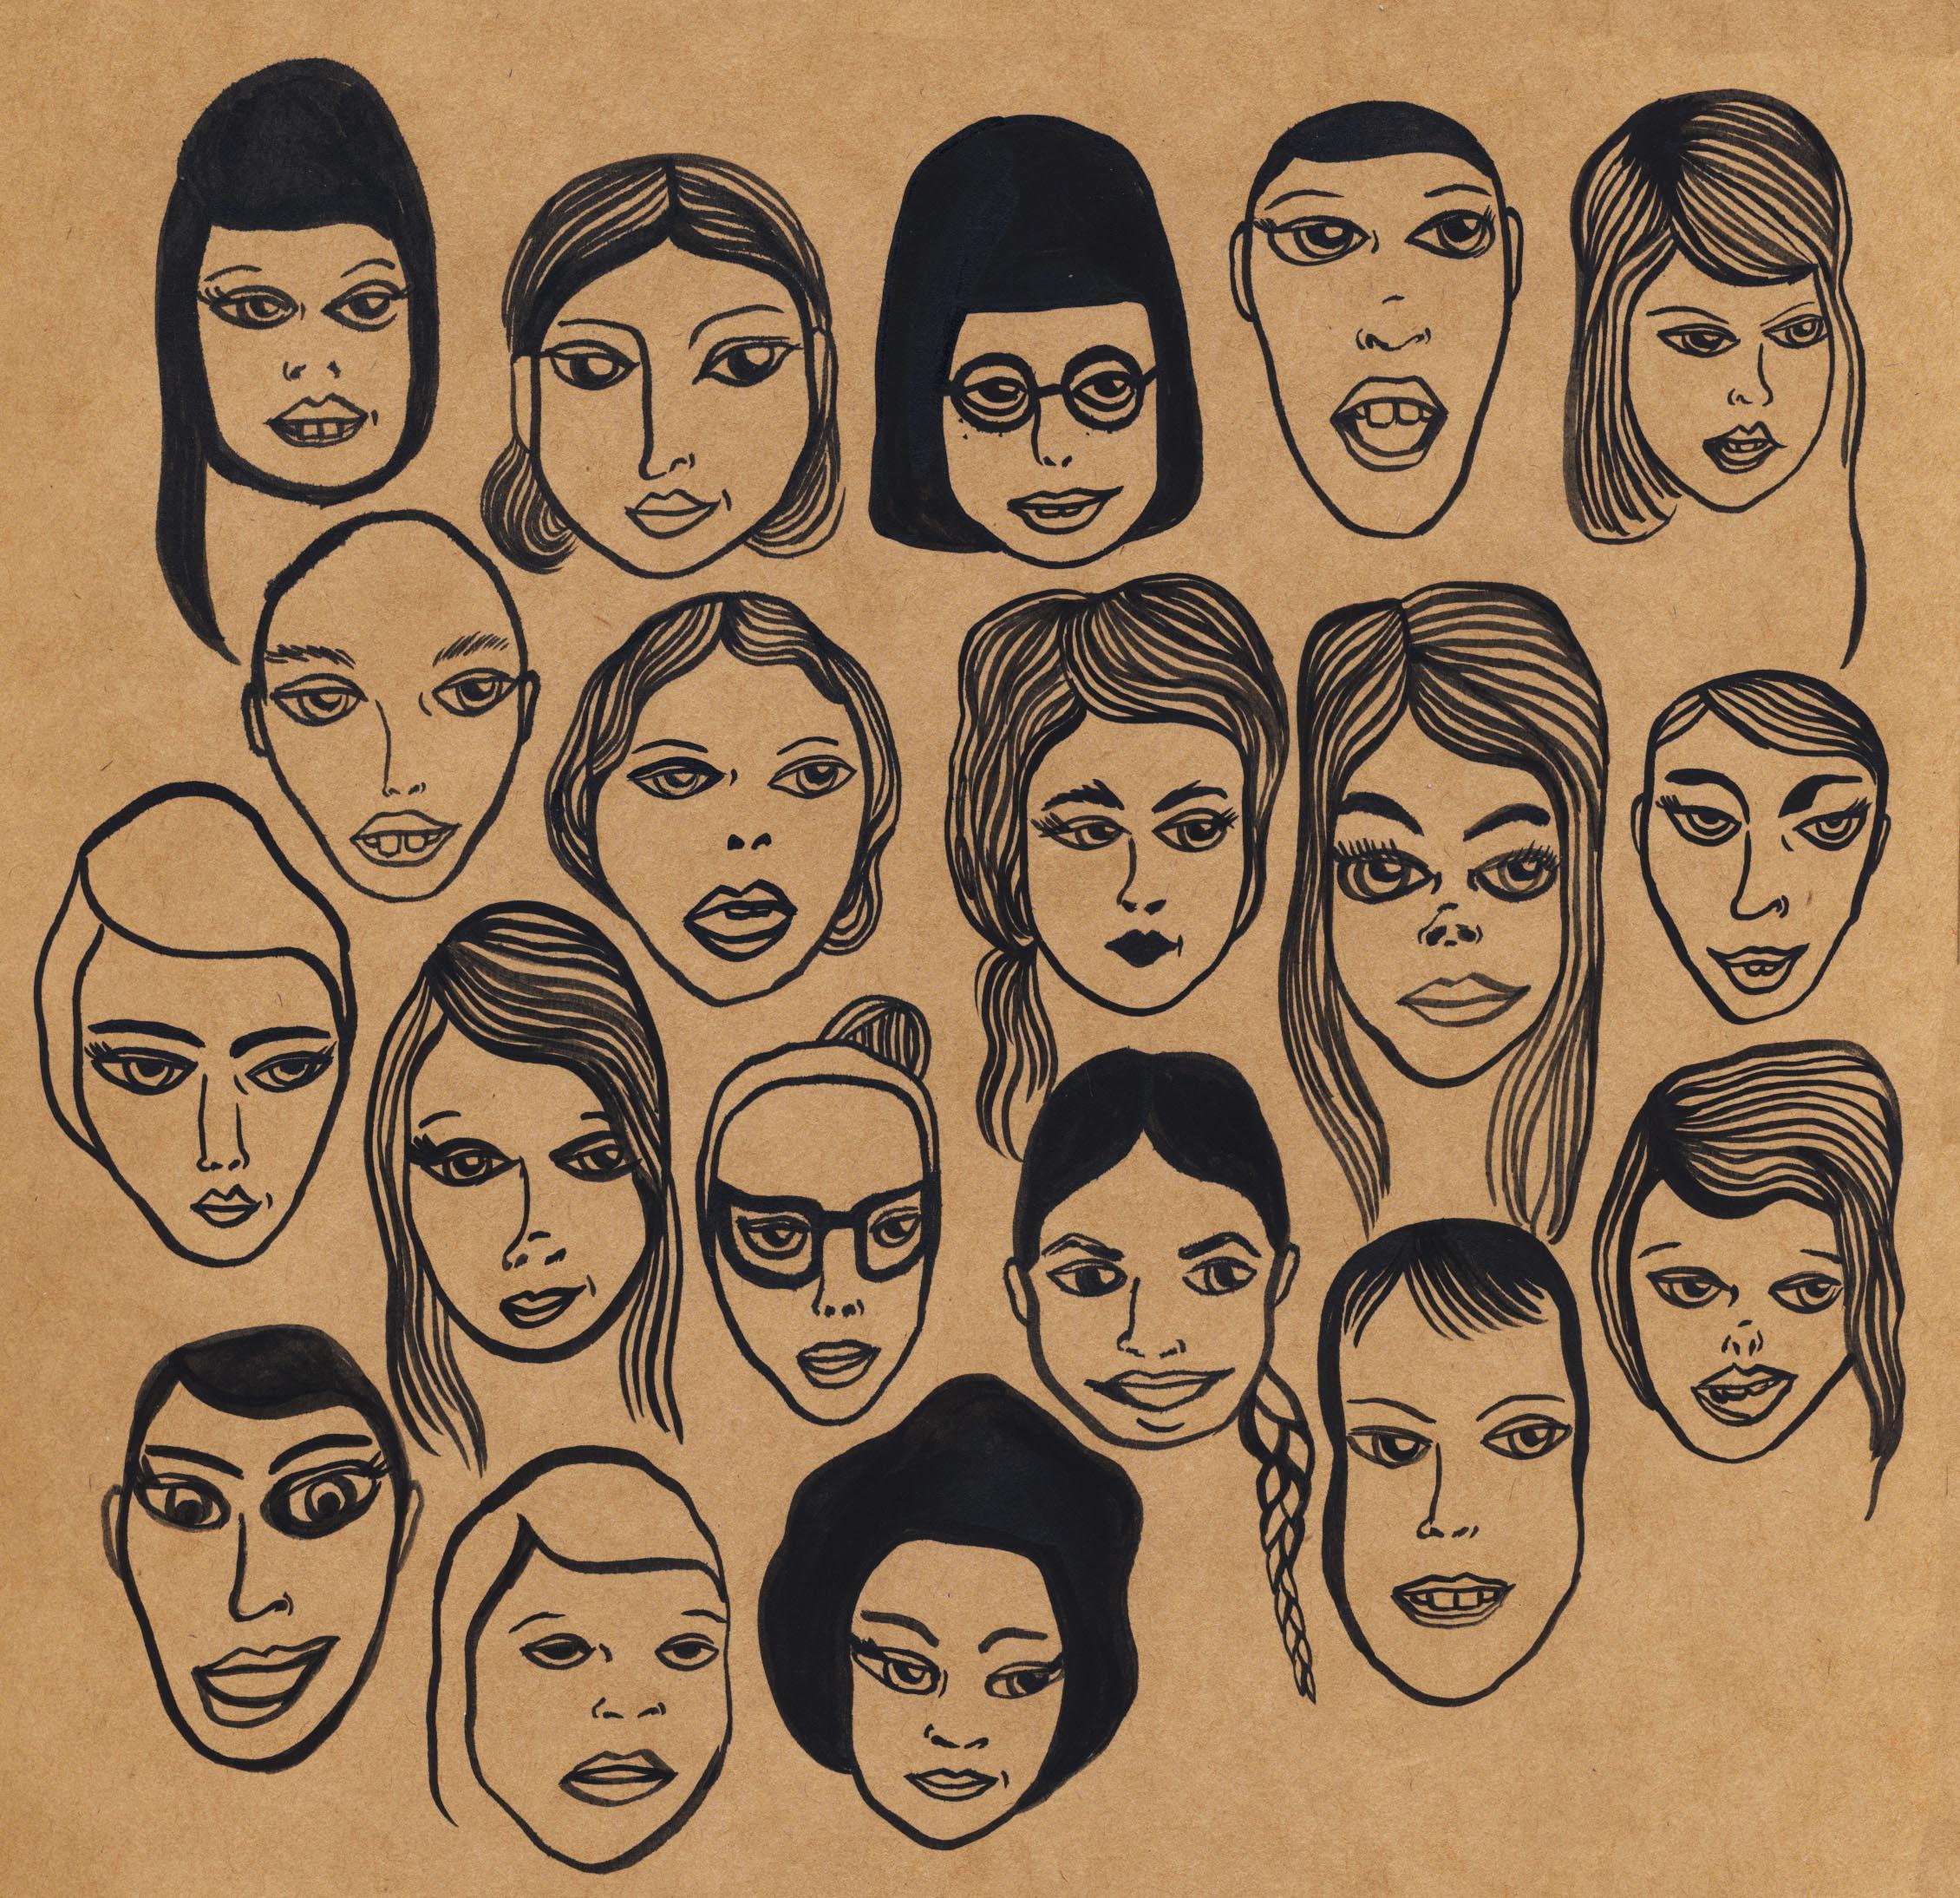 borwn paper faces.jpg